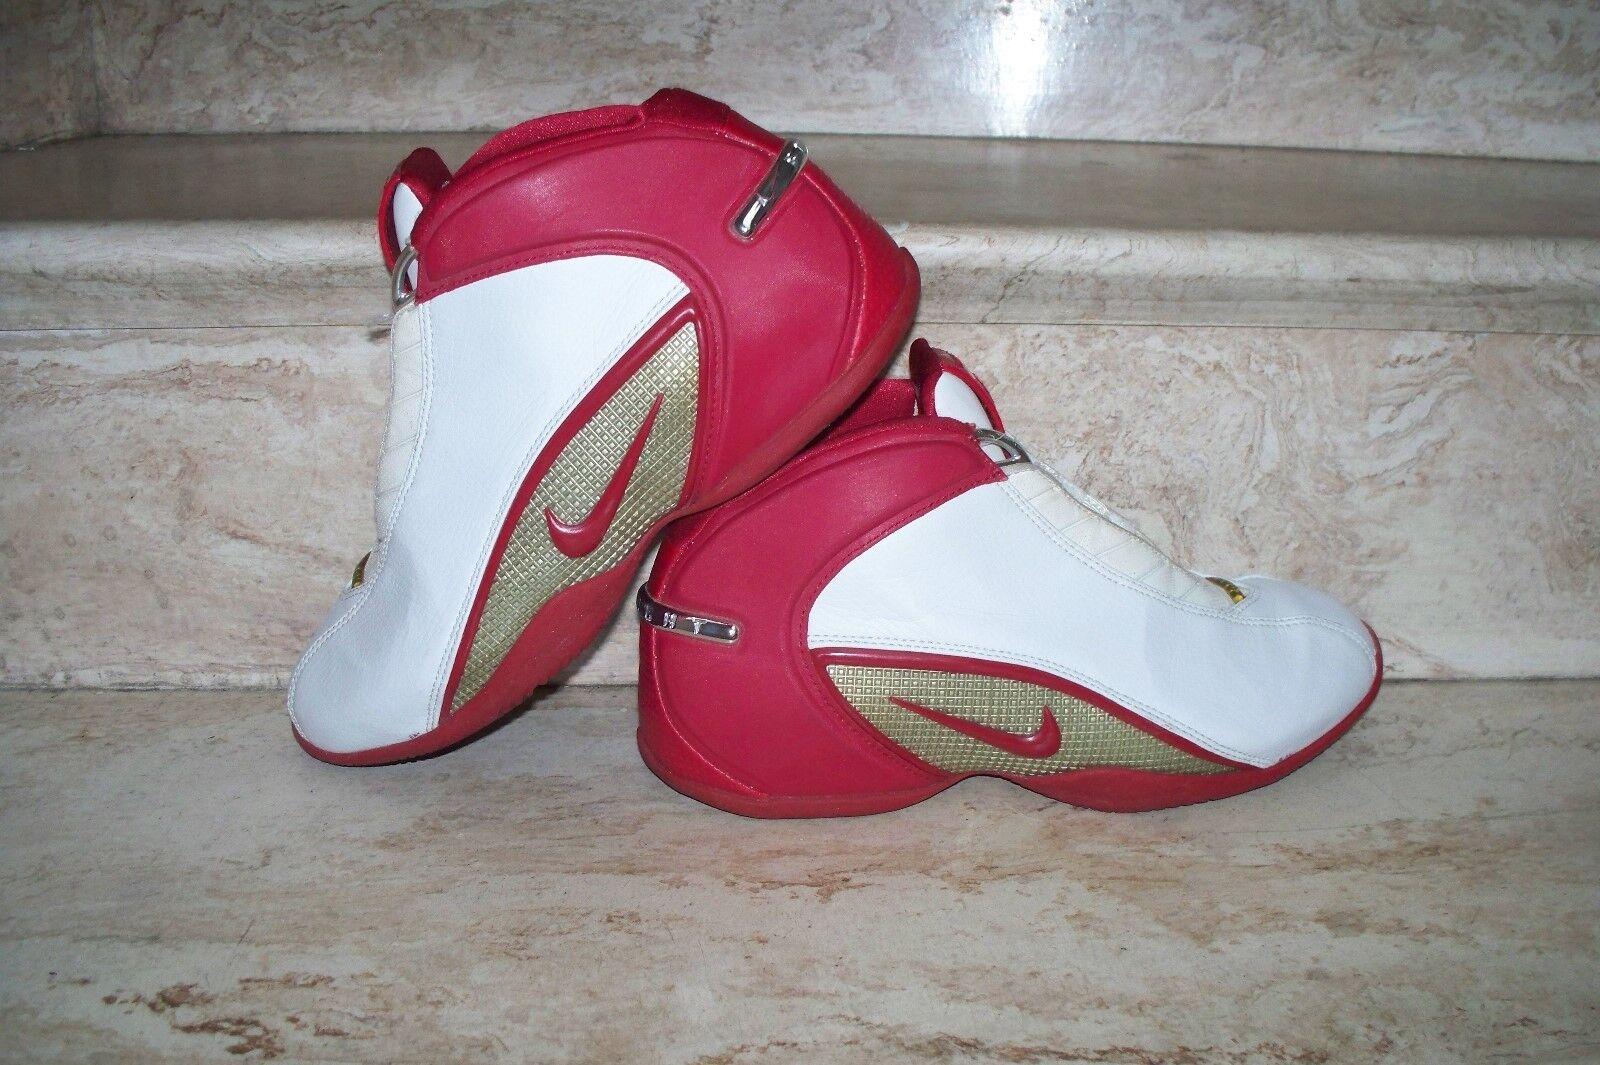 c88f6be6a4 Nike volo zoom air bianco e scarpe rosse 030608 y3 8 | | Uomini ...